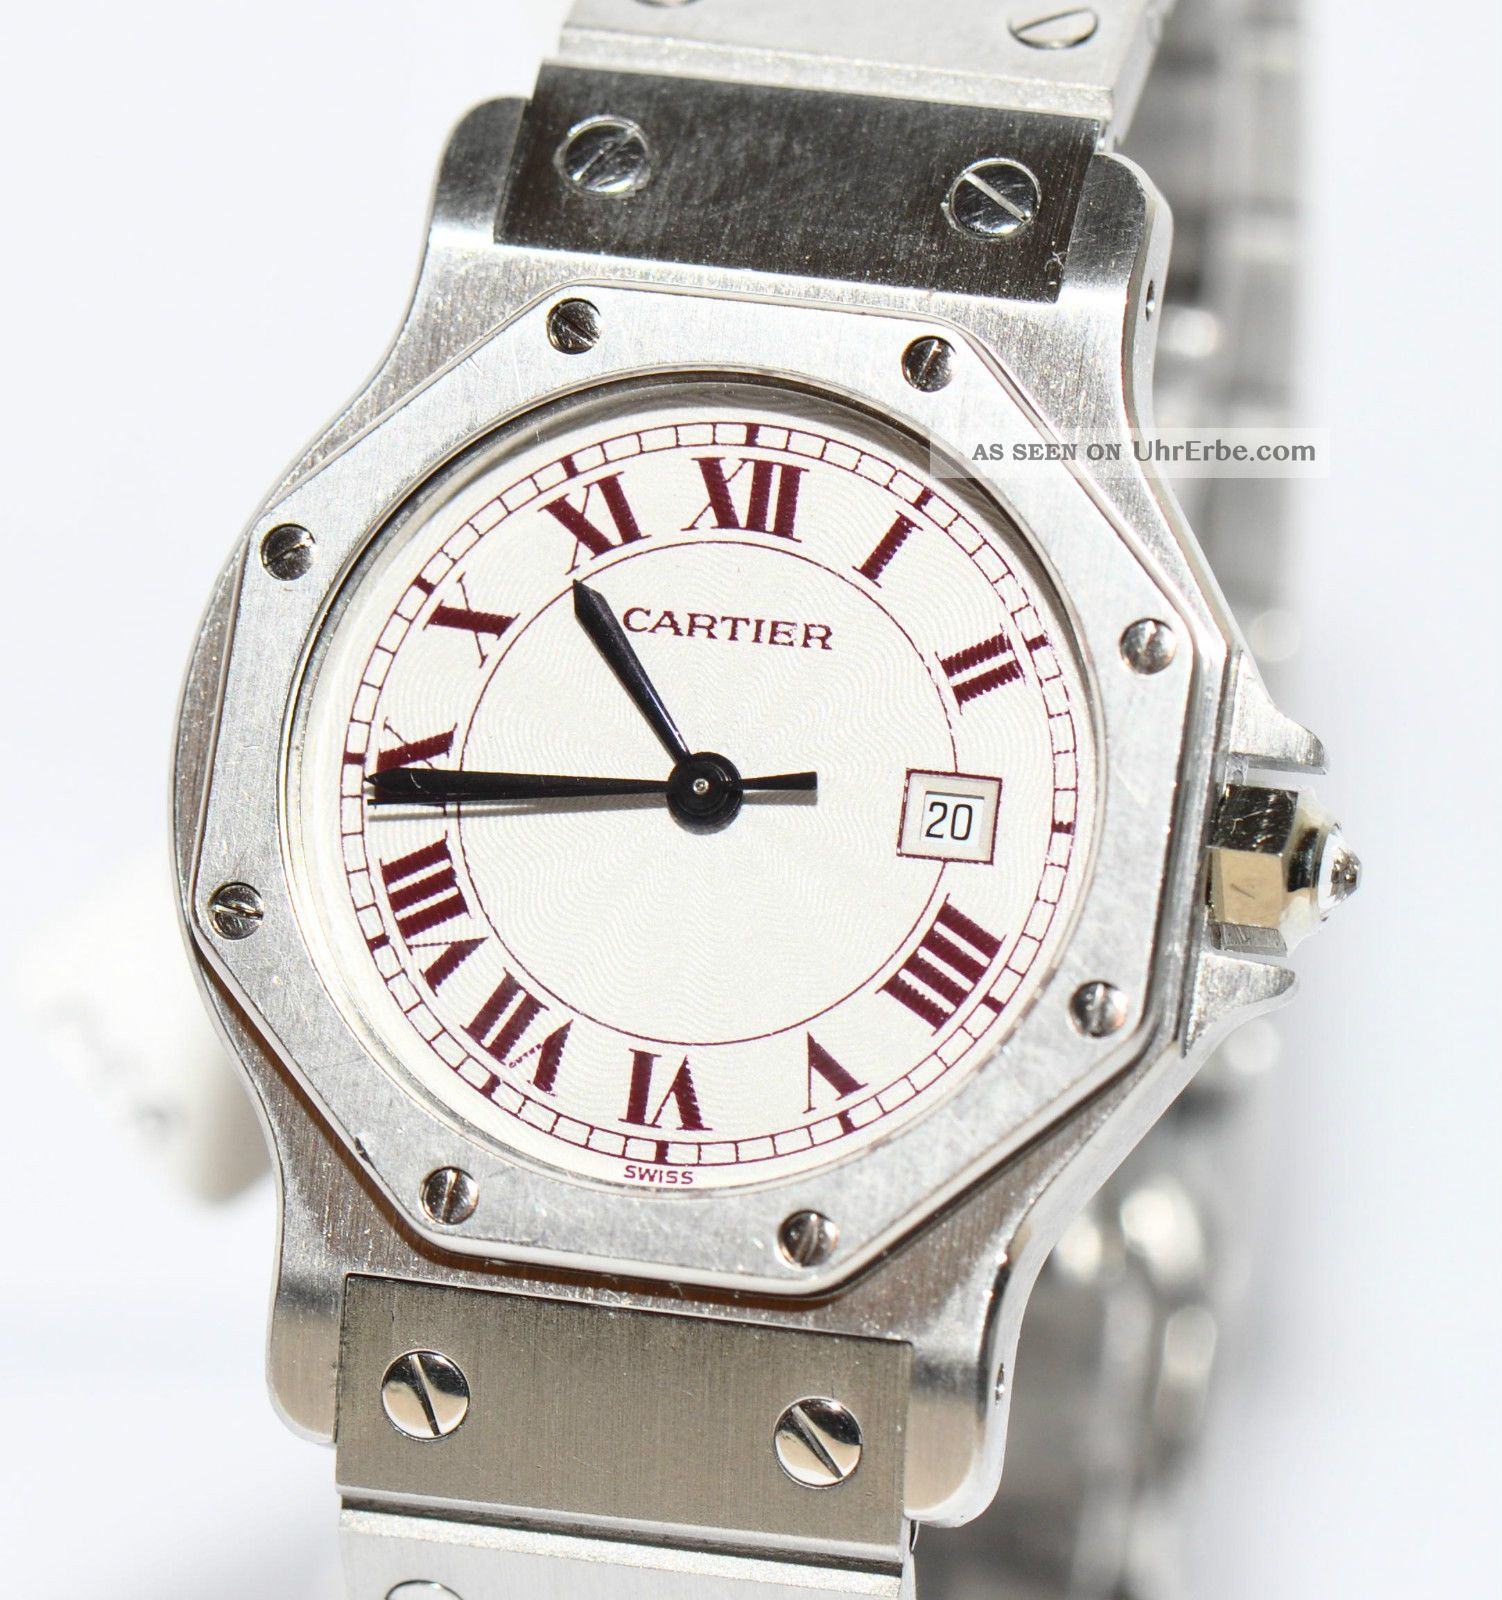 Cartier Santos Platin Uhr Papiere Box Von 1985 Automatik Armbanduhren Bild